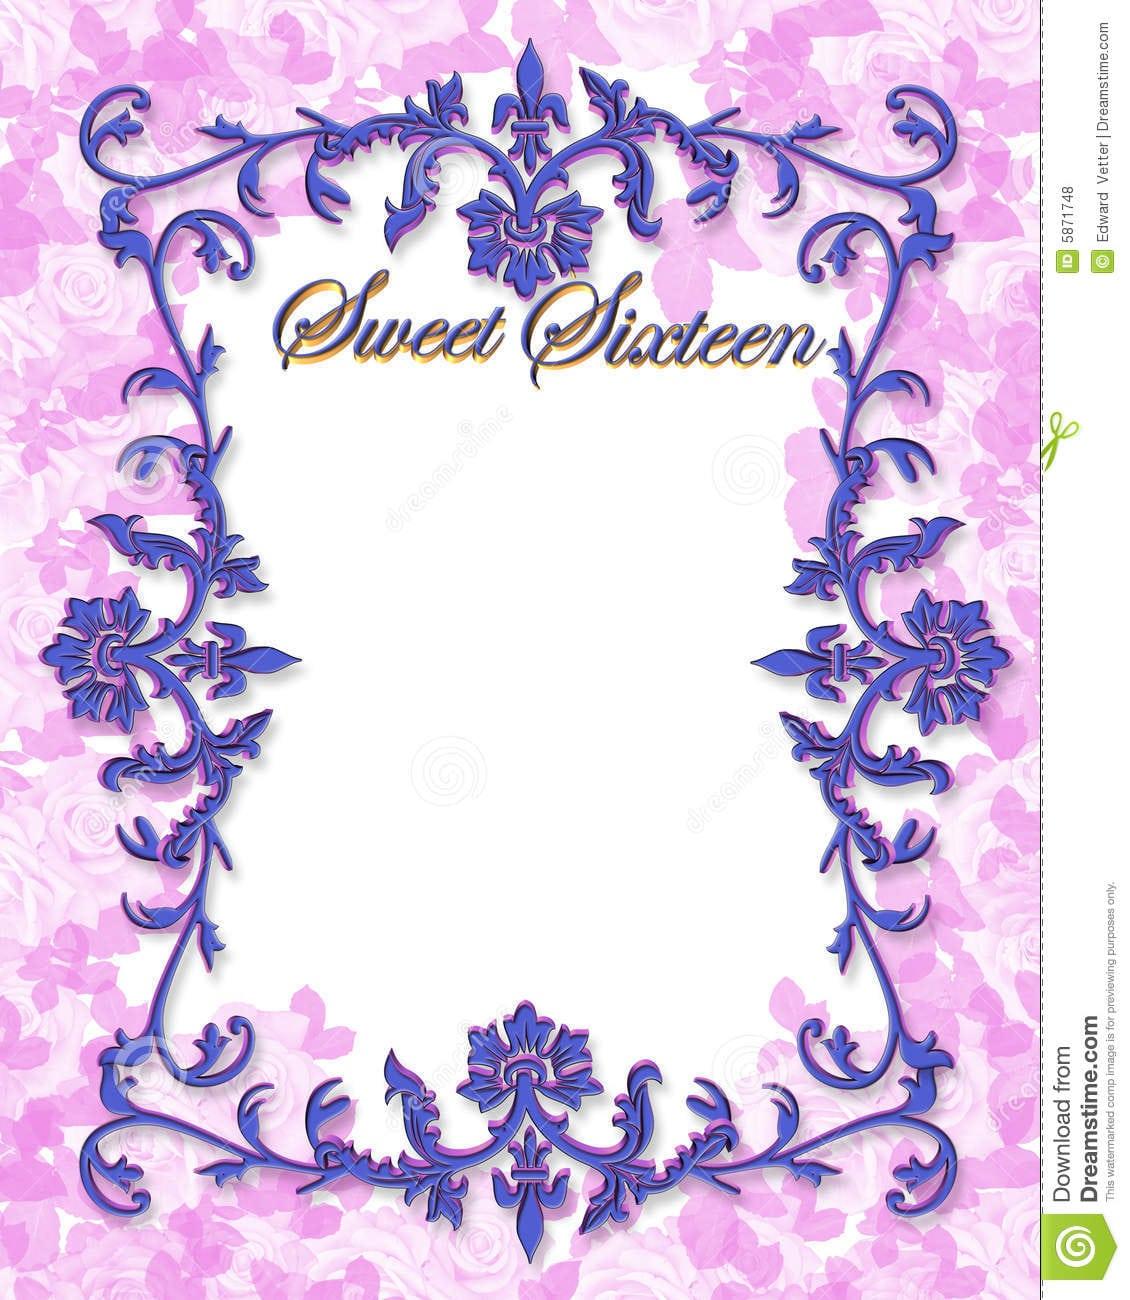 Sweet 16 Party Invitation Stock Illustration  Illustration Of